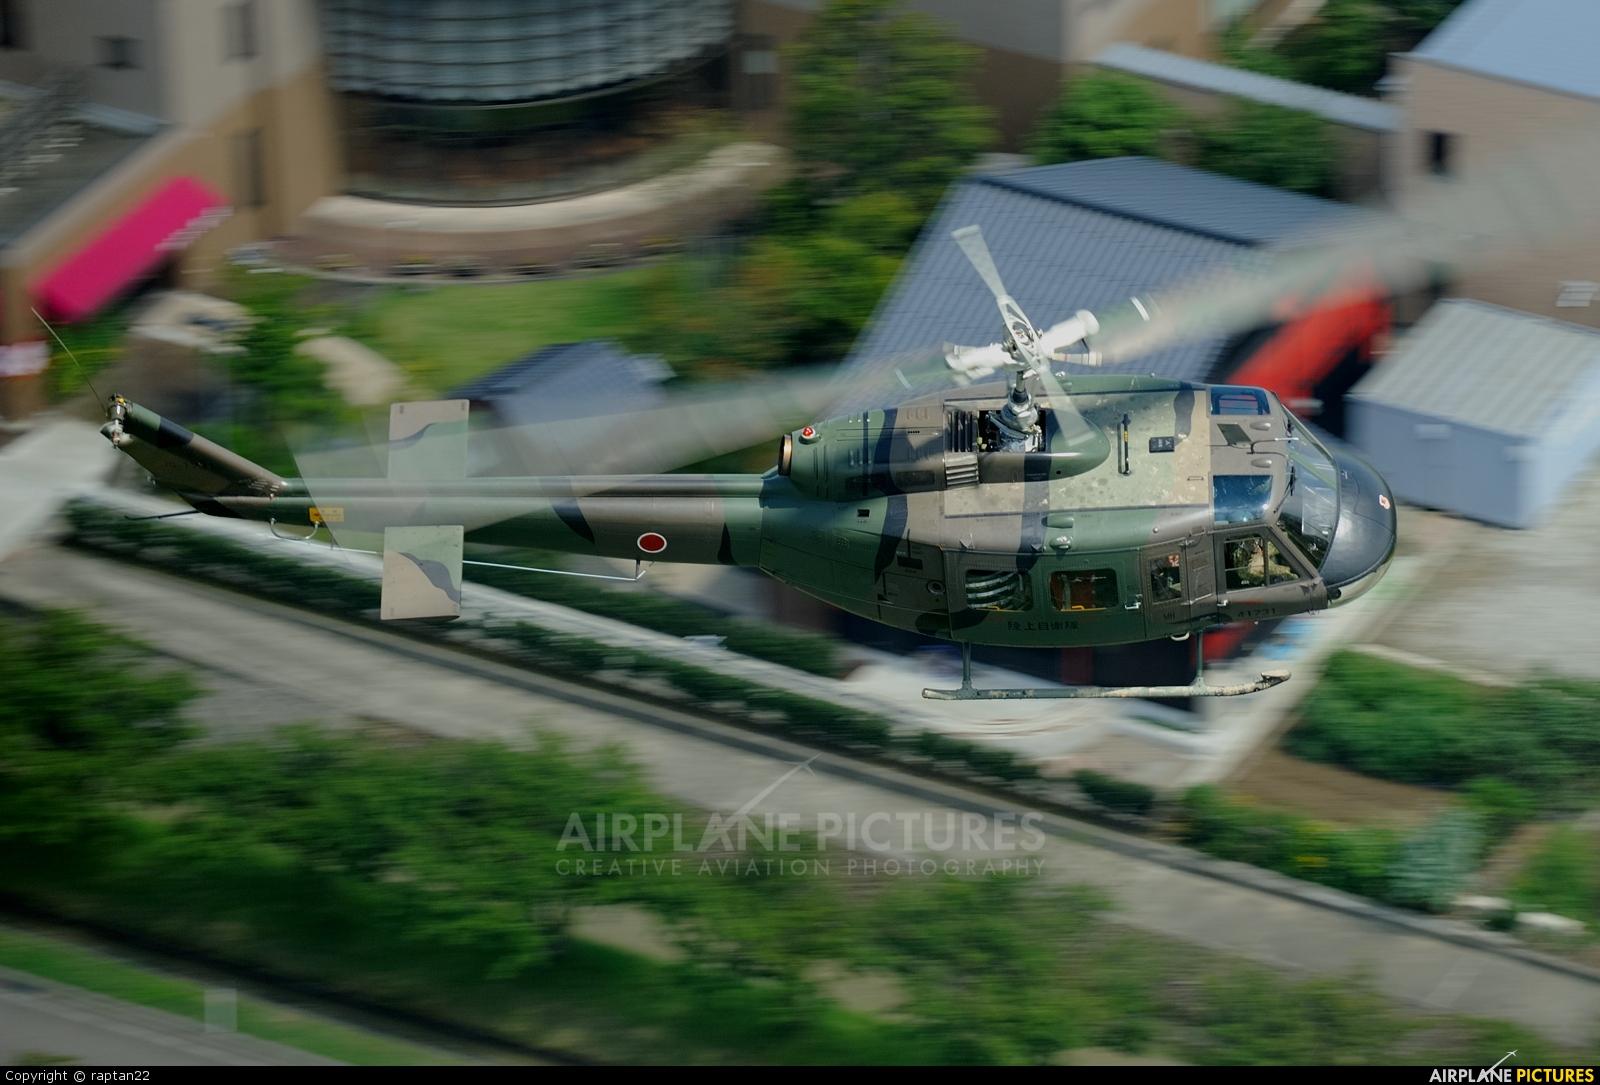 Japan - Ground Self Defense Force 41731 aircraft at Off Airport - Japan